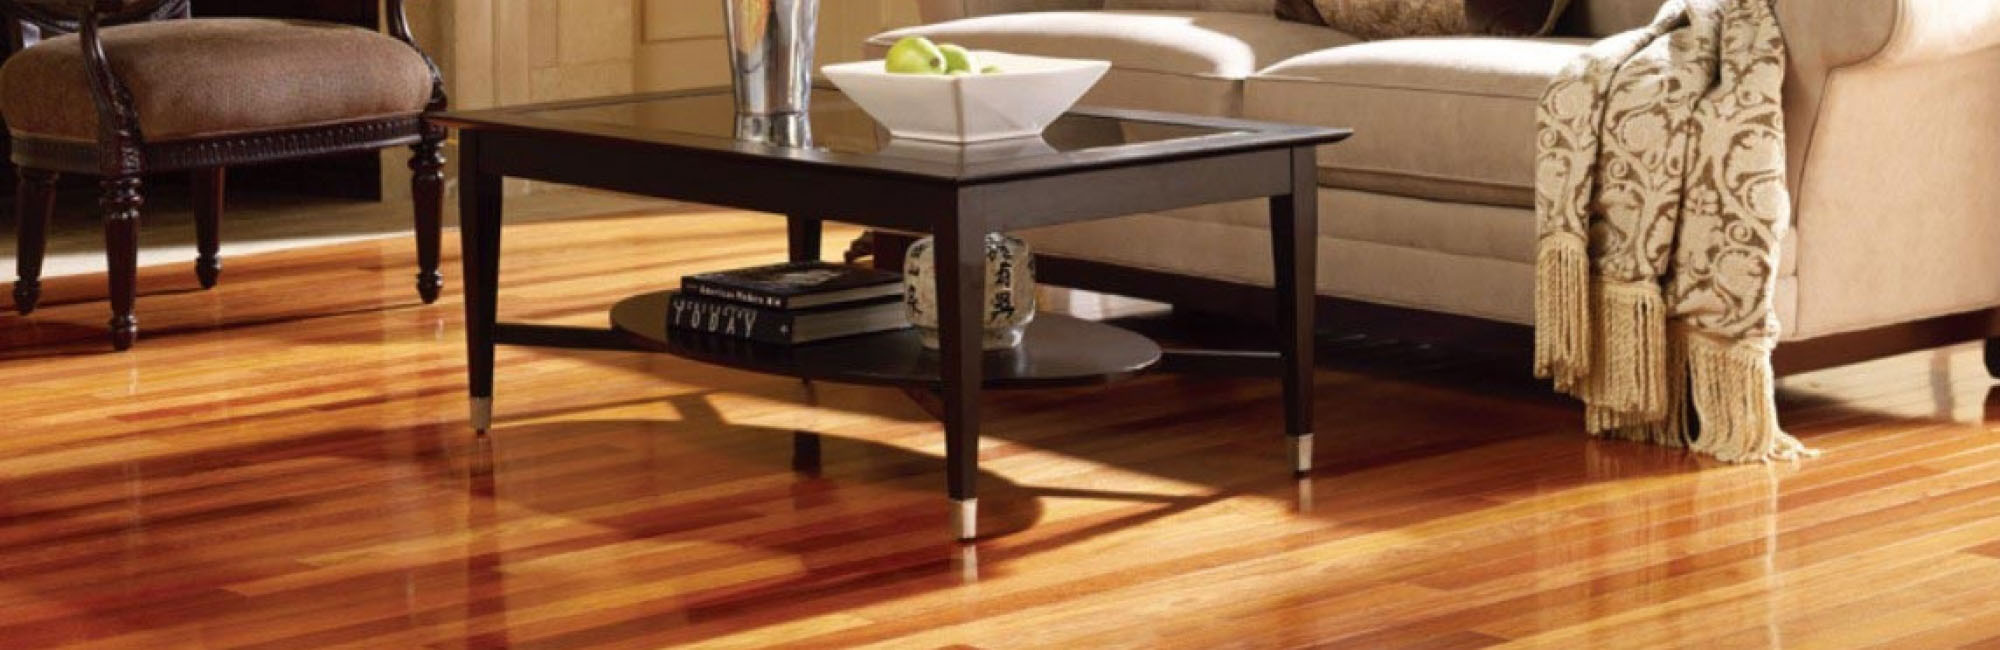 hardwood flooring markham ontario of hardwood flooring deals ontario flooring ideas with elegant hardwood flooring london ontario floor gallery projects flatout buckling is one